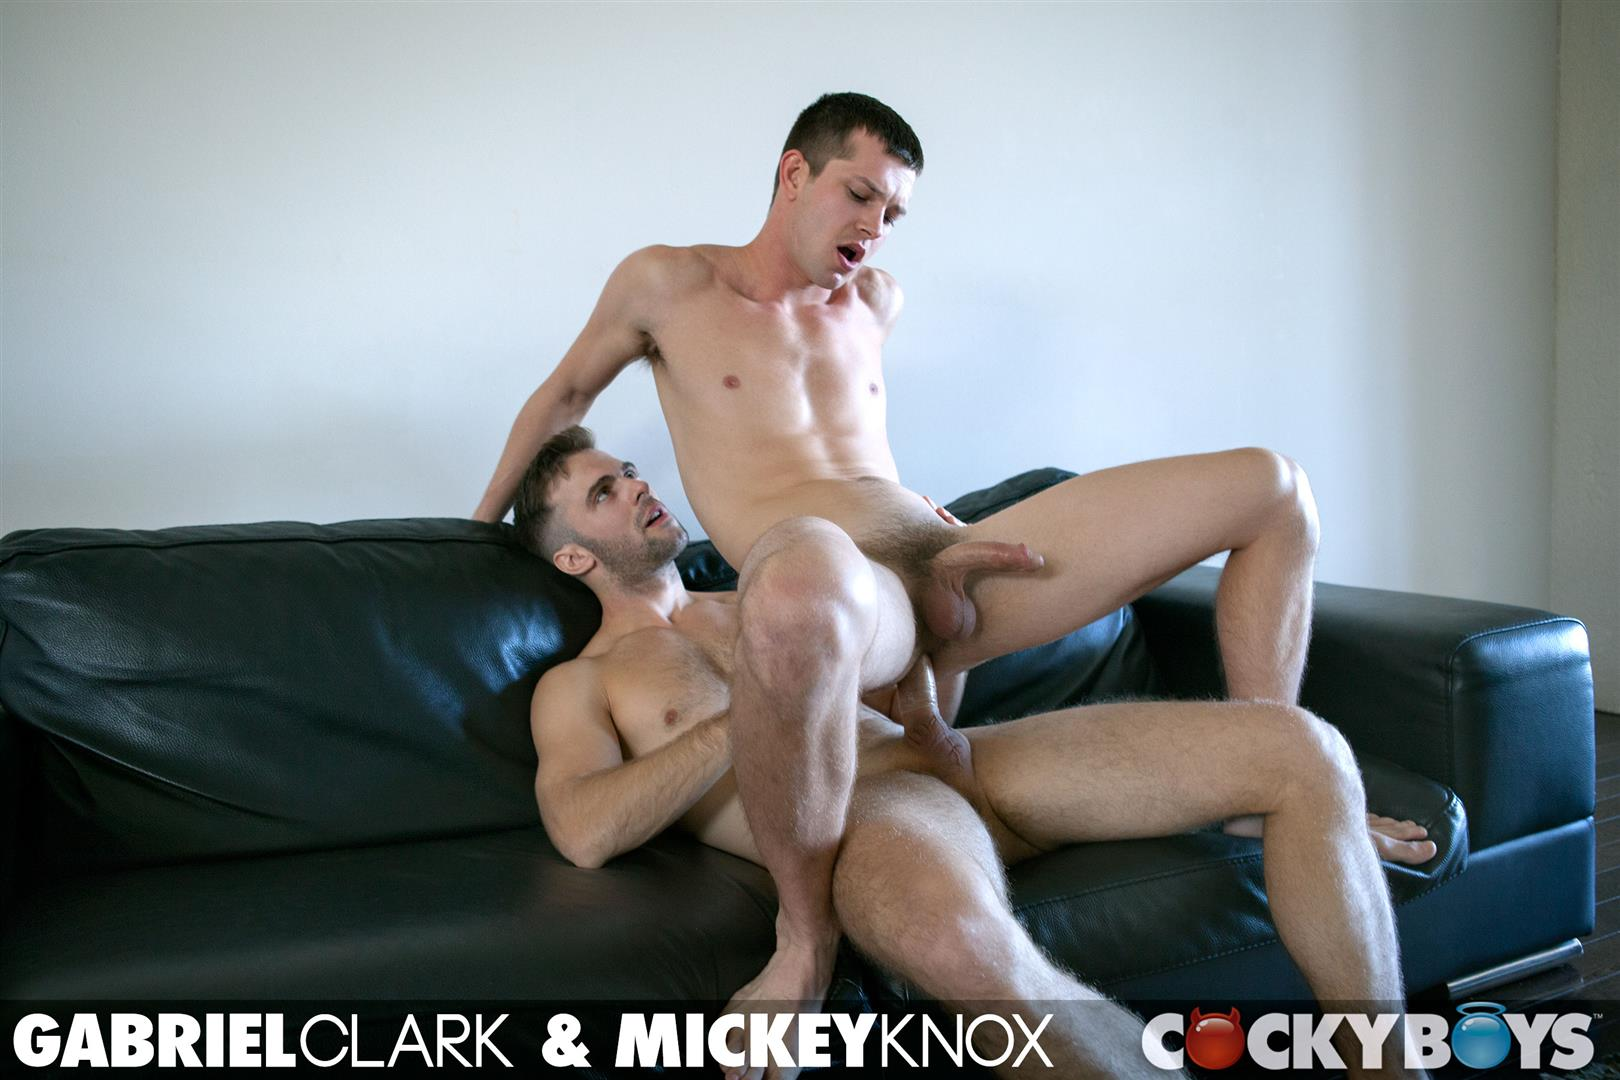 Cockyboys-Mickey-Knox-and-Gabriel-Clark-American-Boys-Thick-Cocks-Fucking-Amateur-Gay-Porn-26 All American Boys Mickey Knox and Gabriel Clark Share A Fuck